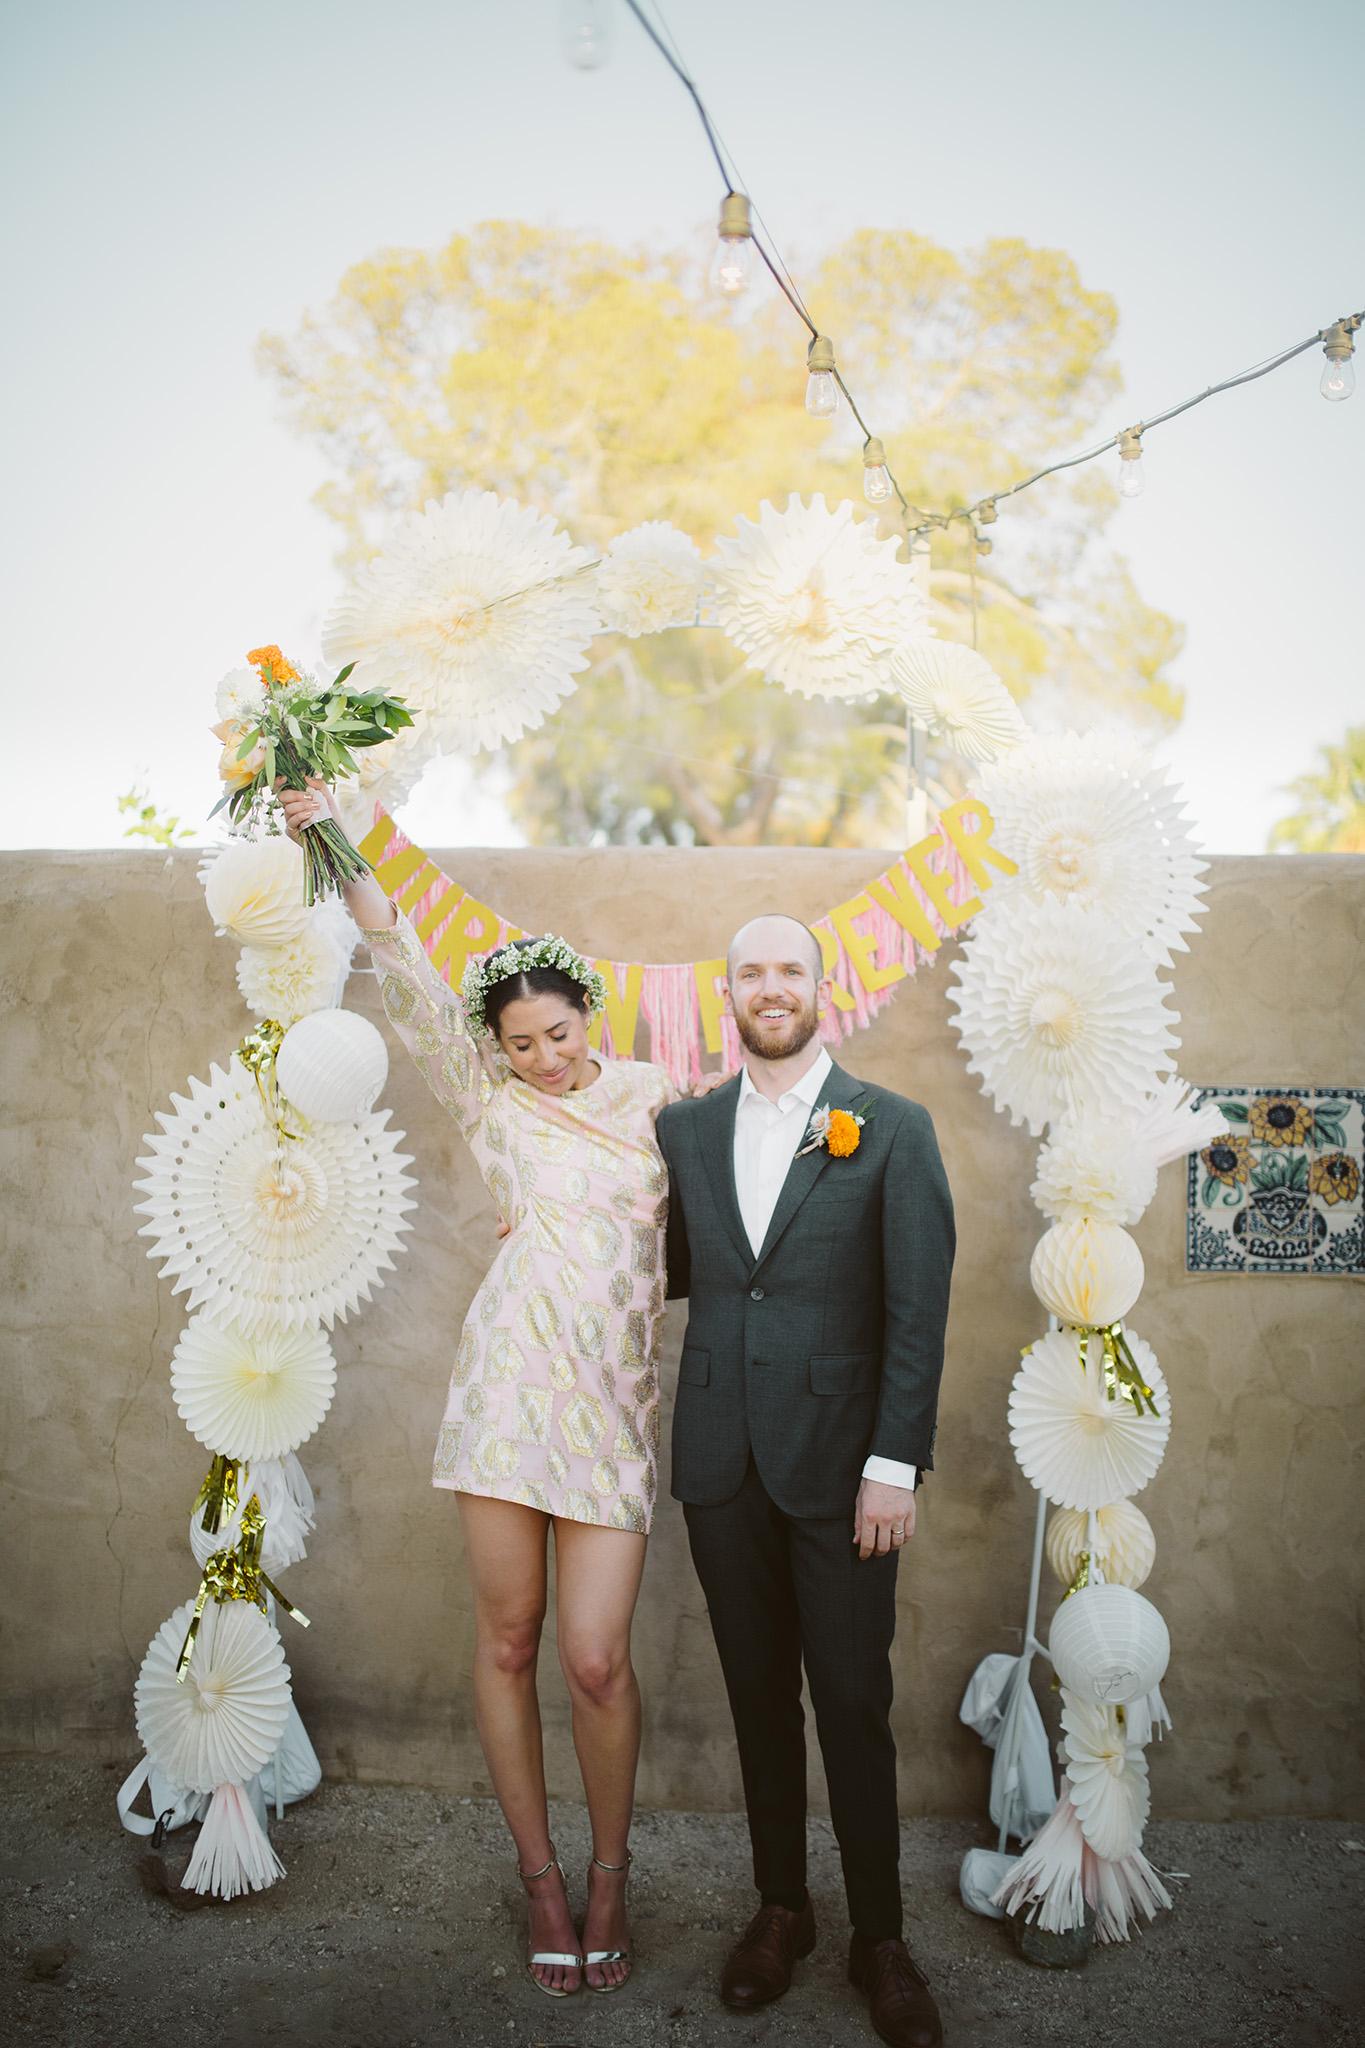 Ceremony site at 29 palms inn wedding